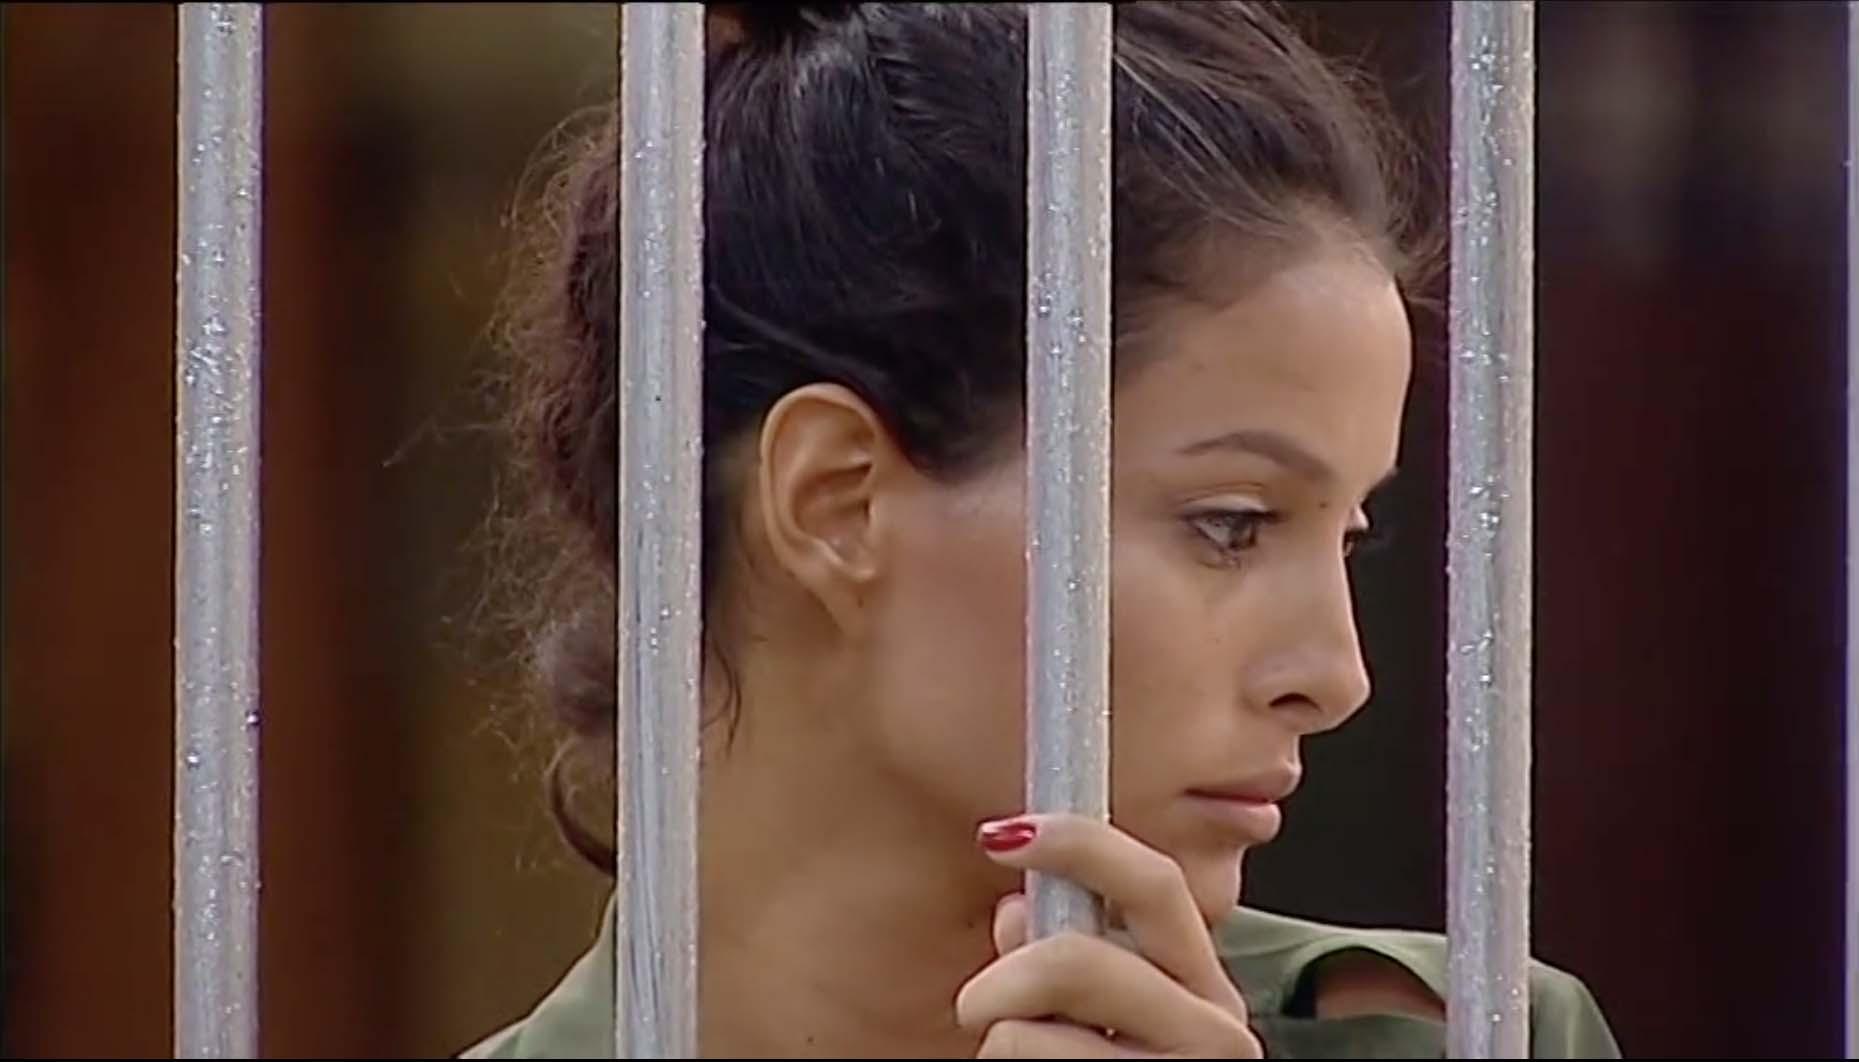 Mariana Rodriguez, notte insonne al GF Vip: Andrea la consola